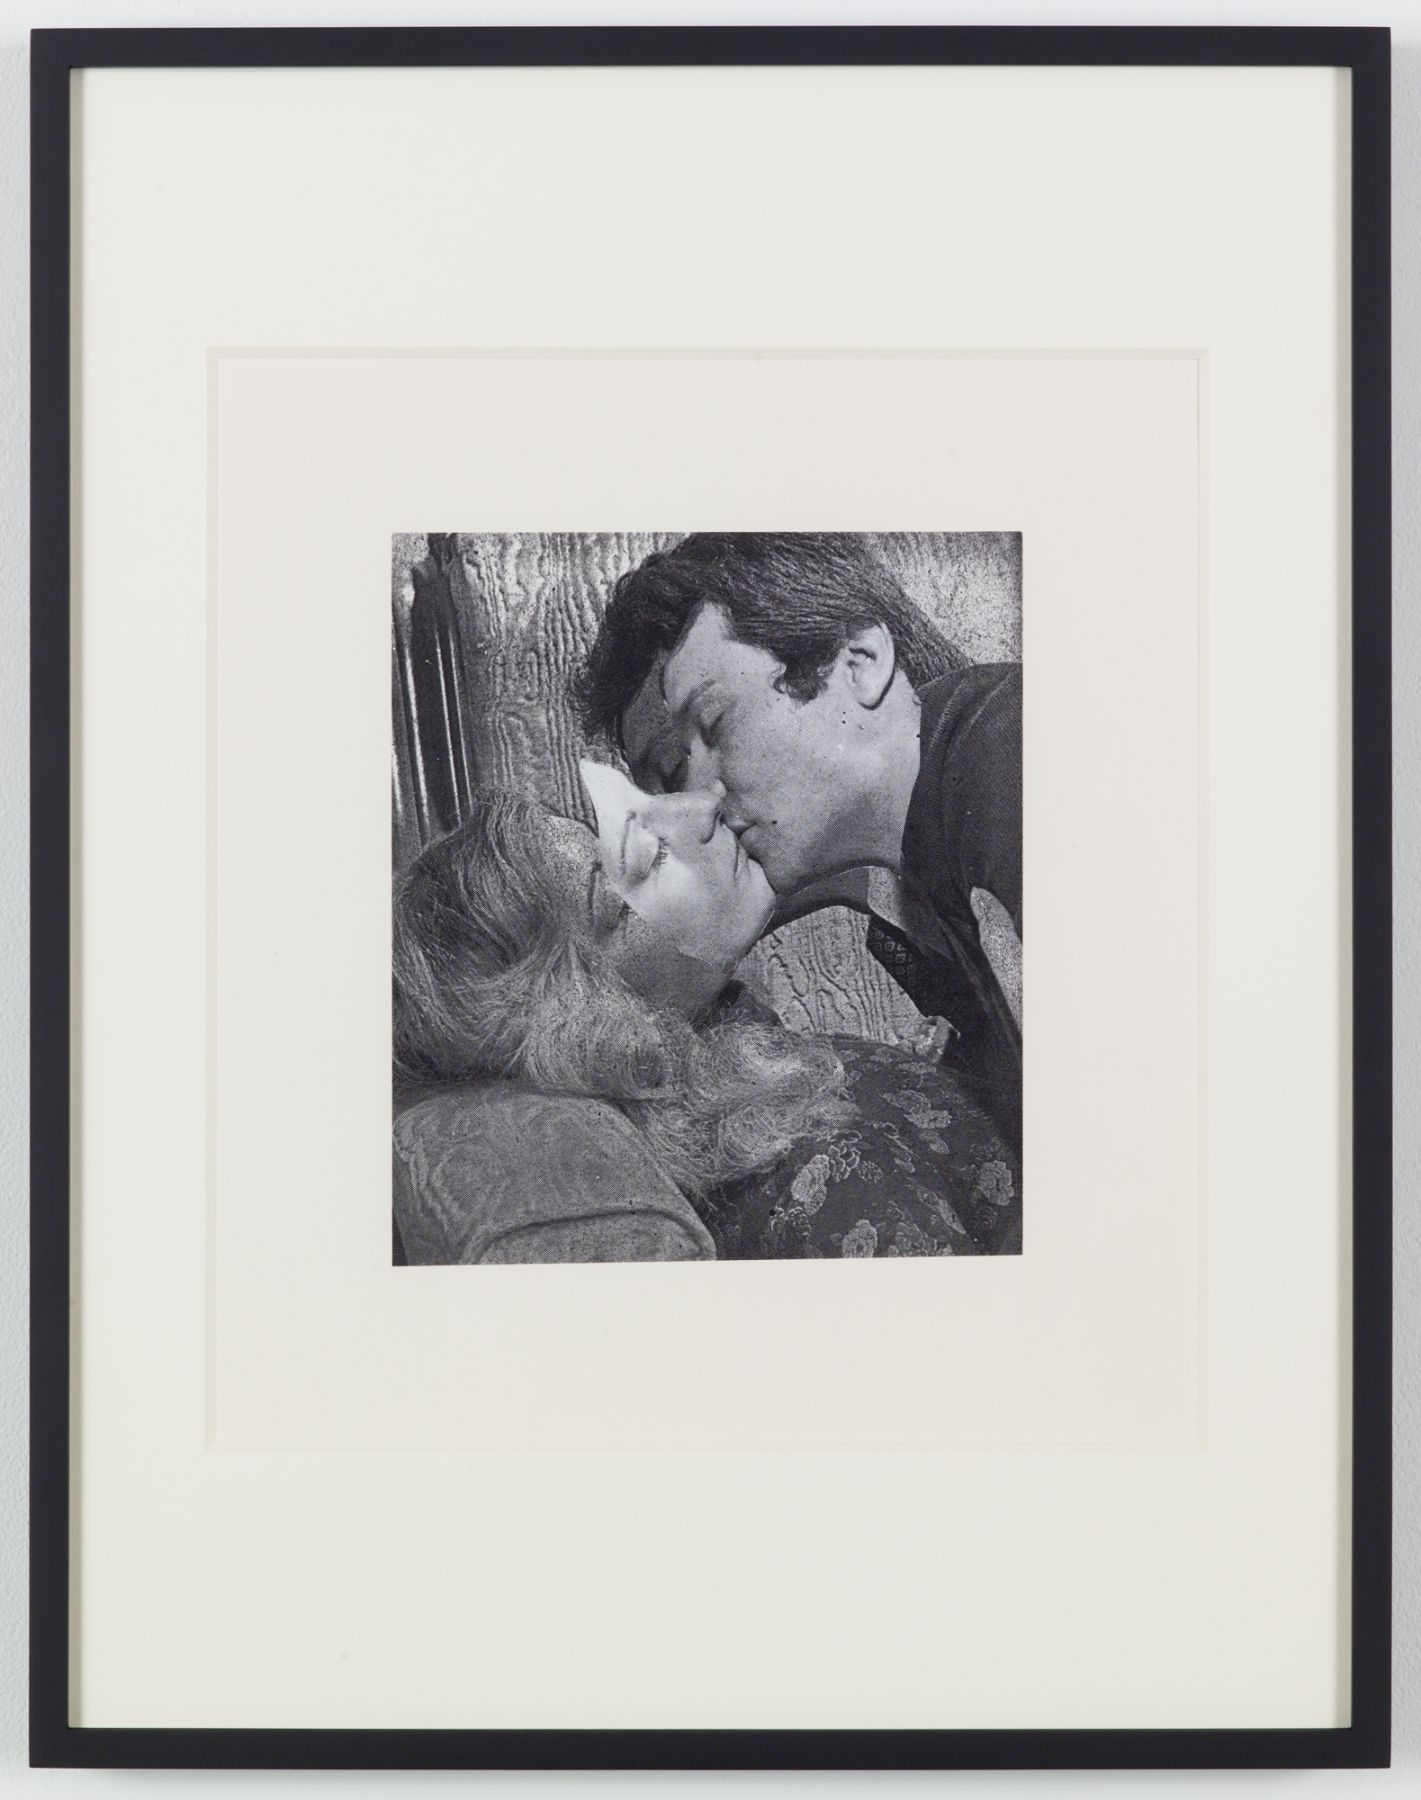 John Stezaker, Kiss III (Photoroman)